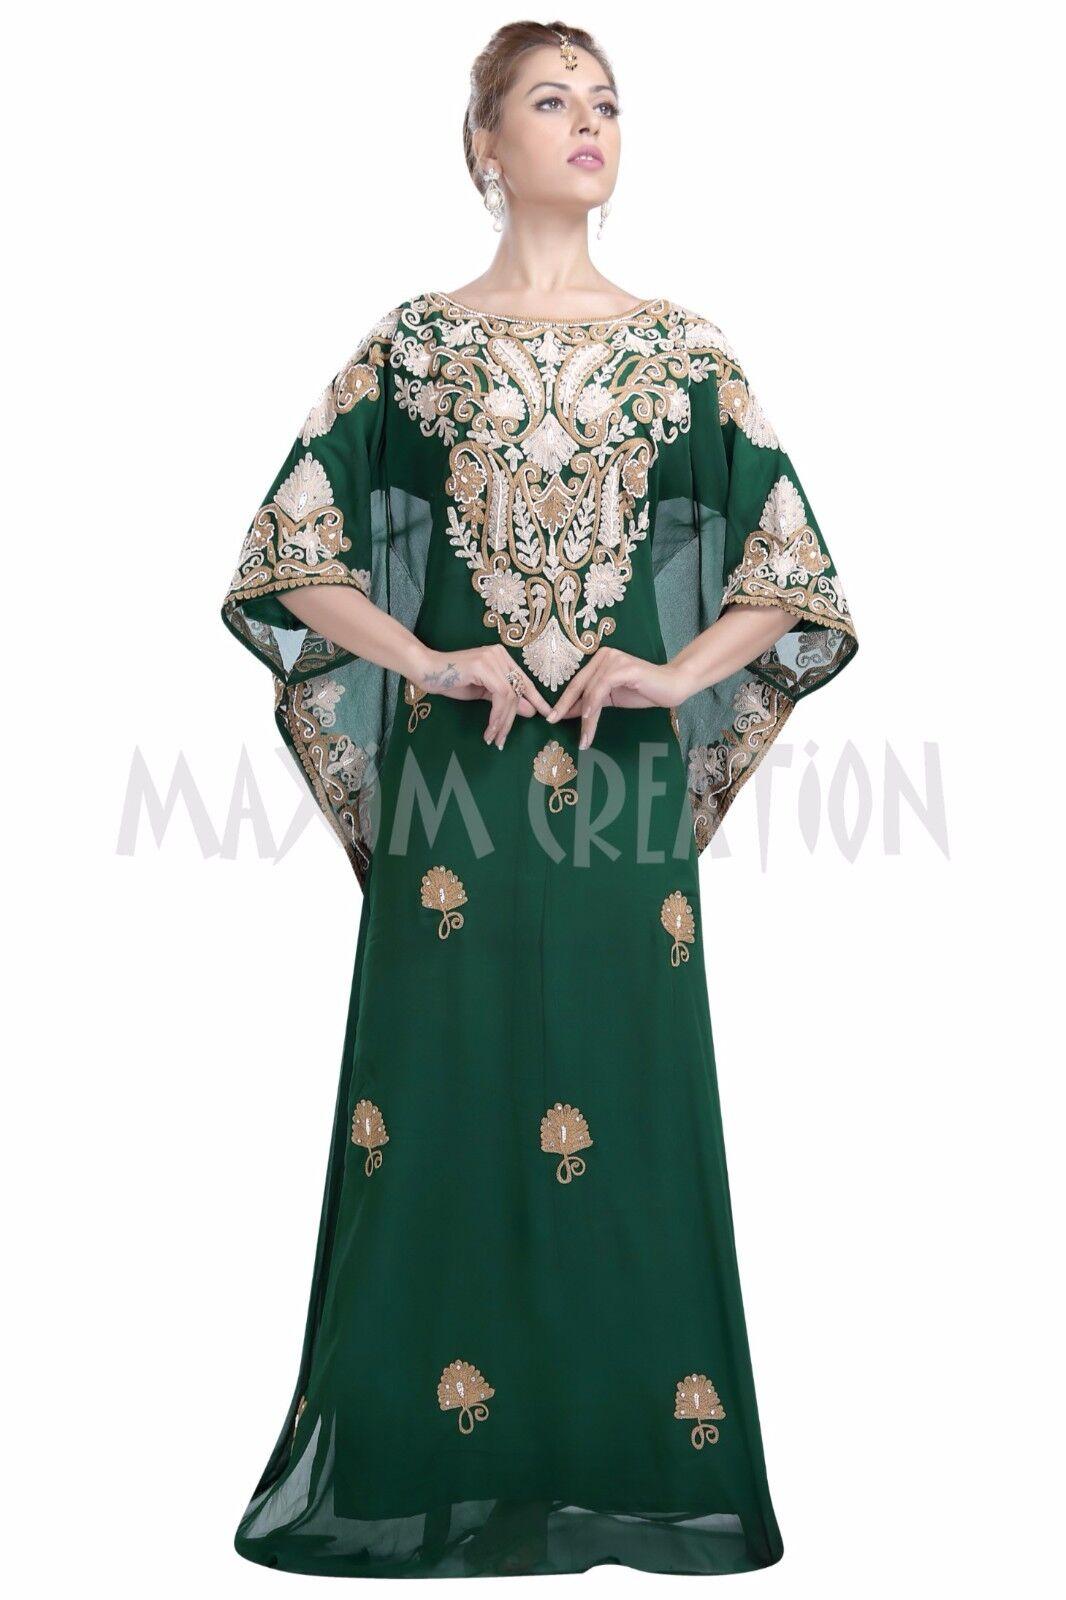 Daily Home Wear DUBAI MODERN FARASHA BY MAXIM CREATION Soft Gown FOR WOMEN 6047